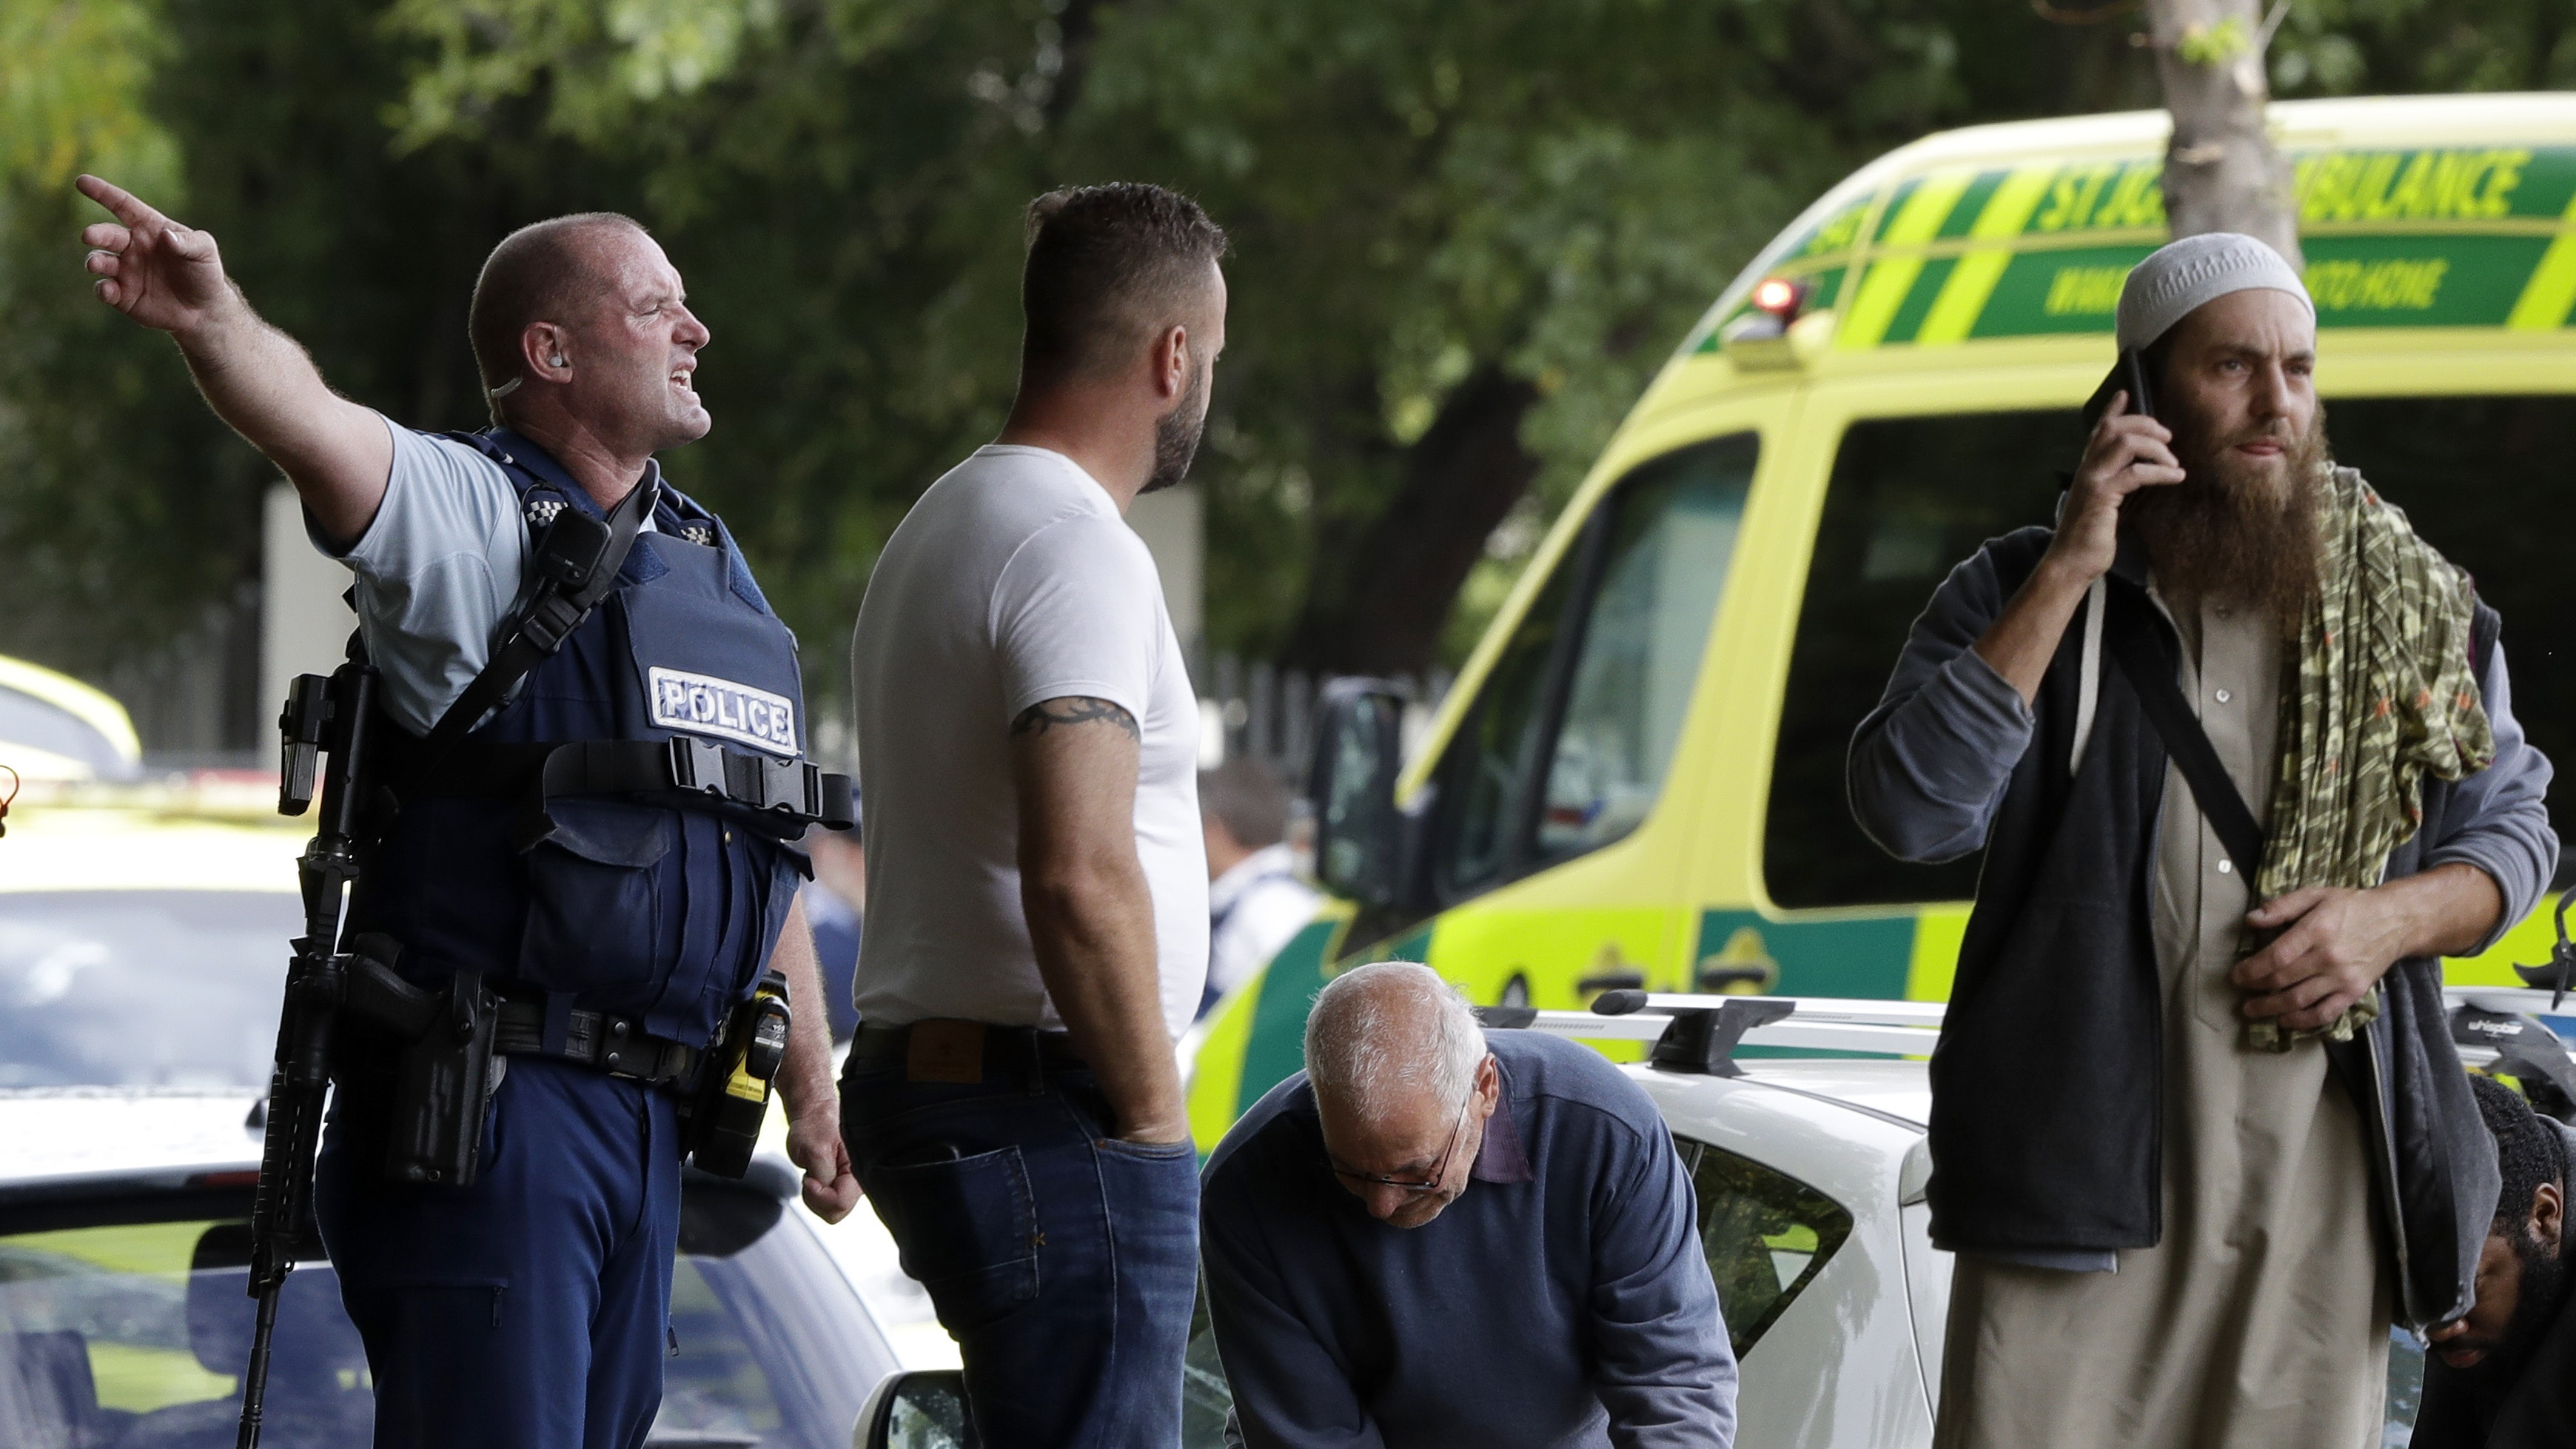 New Zealand Massacre Photo: PM May Leads UK Condemnation Of New Zealand Mosque